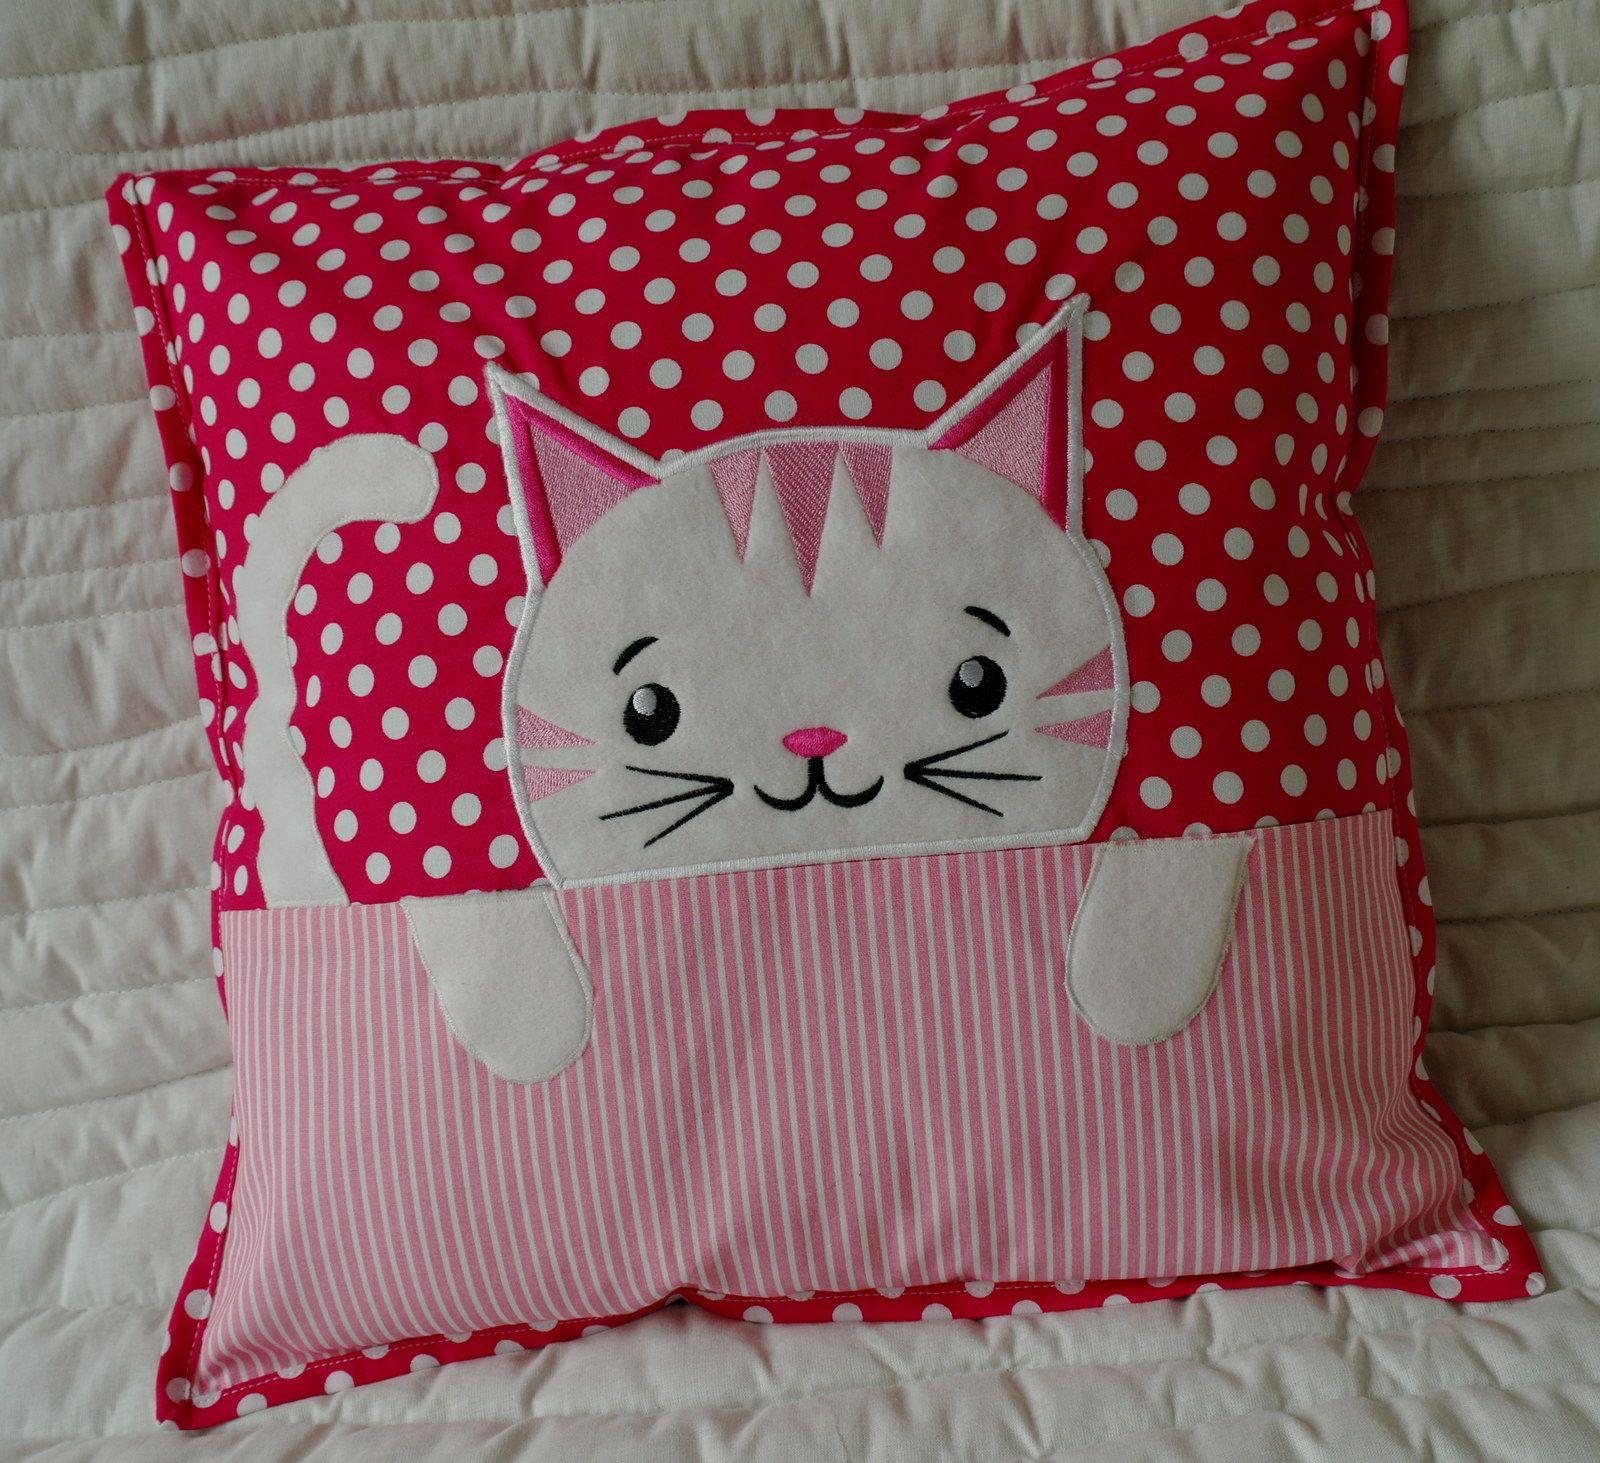 Pin de sandra silva en almofadas pinterest gato - Cojines infantiles originales ...